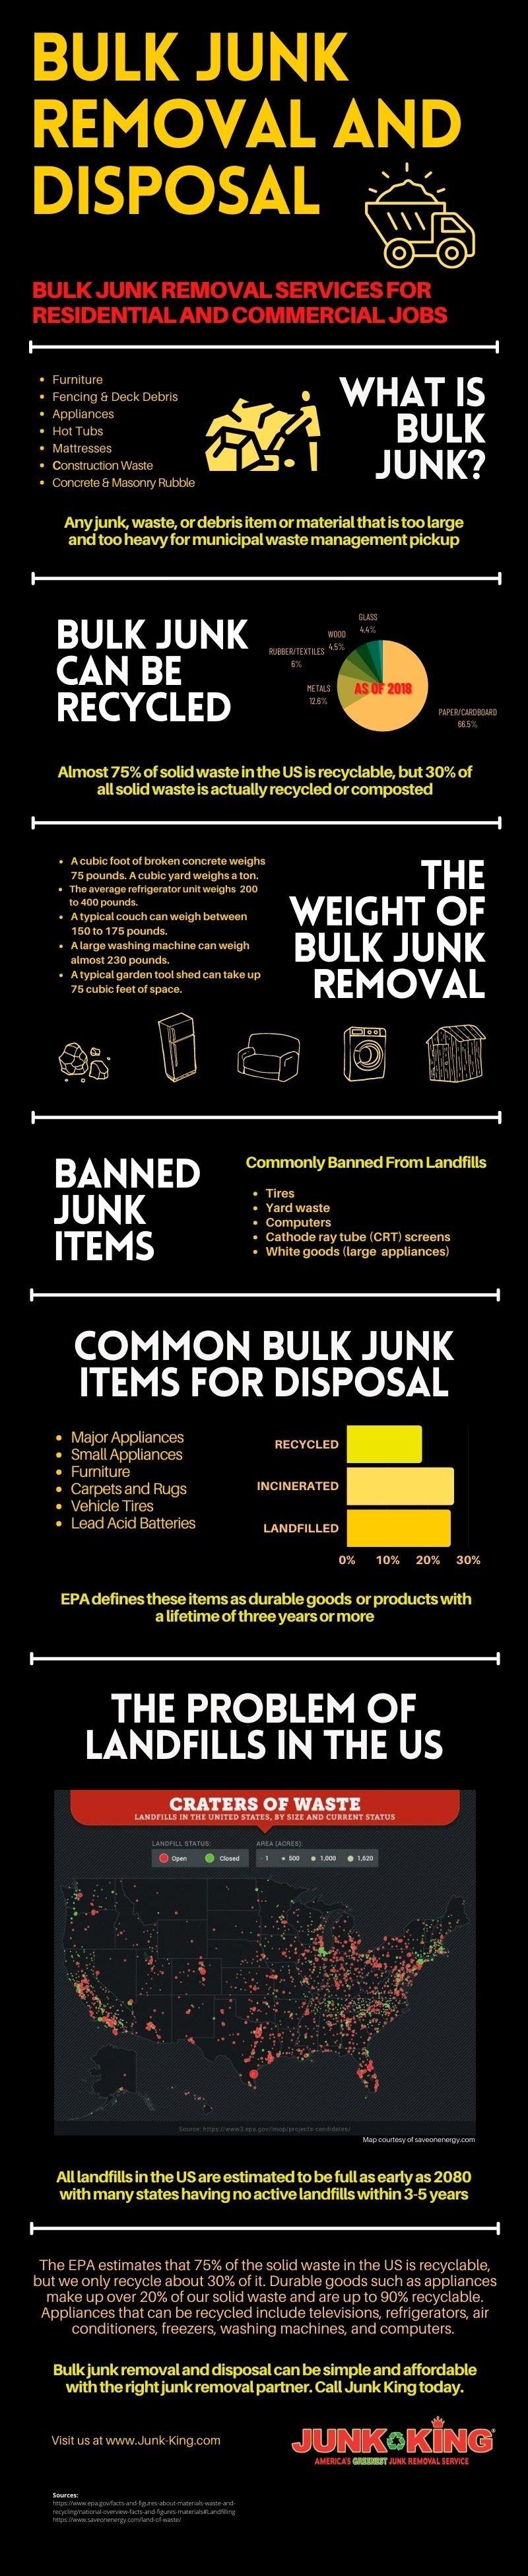 bulk-junk-removal-and-disposal